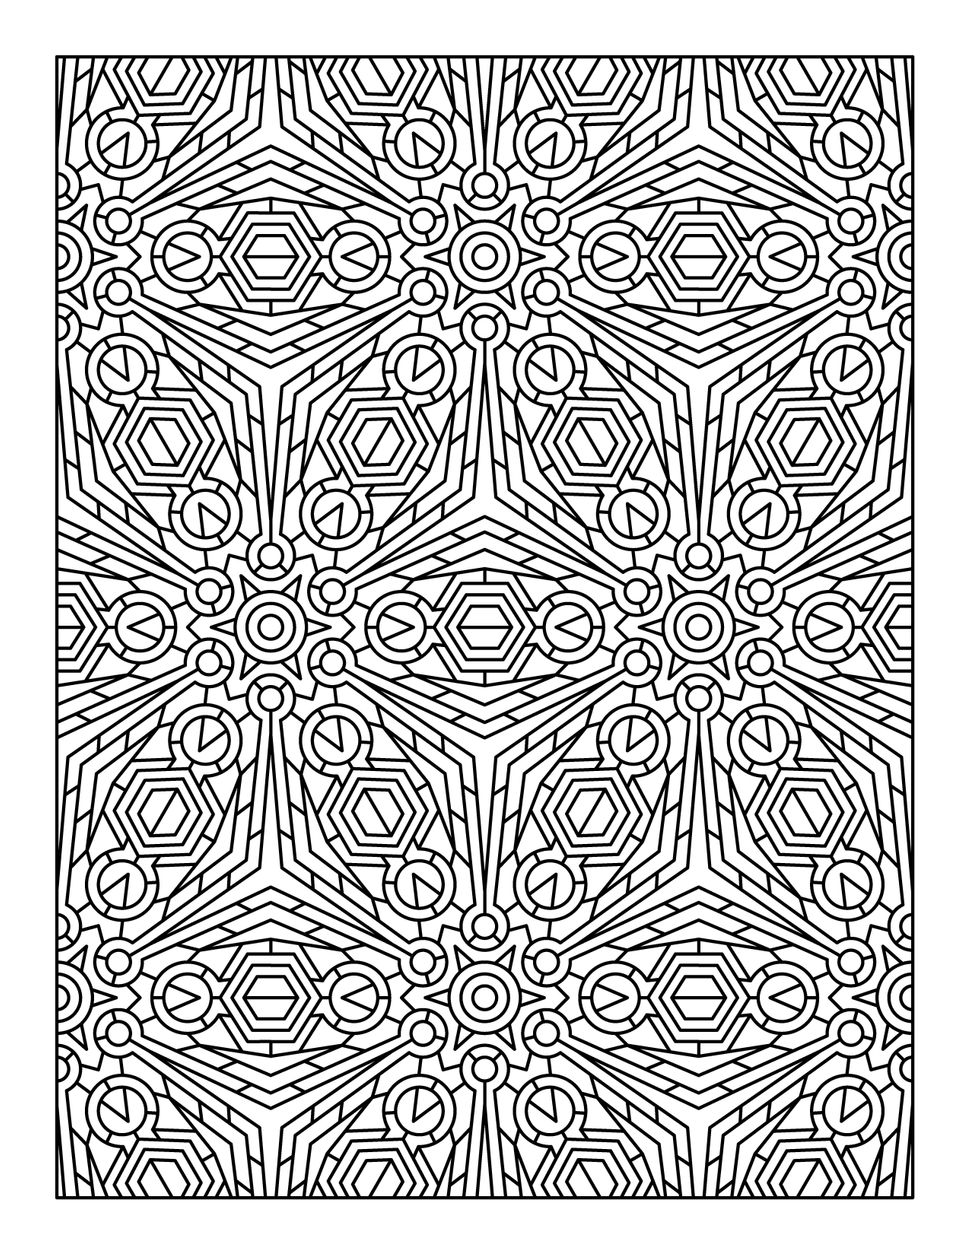 "<em>""<a href=""http://www.amazon.com/Creative-Haven-Tessellation-Patterns-Coloring/dp/048649165X/ref=sr_1_12?ie=UTF8&keywords="